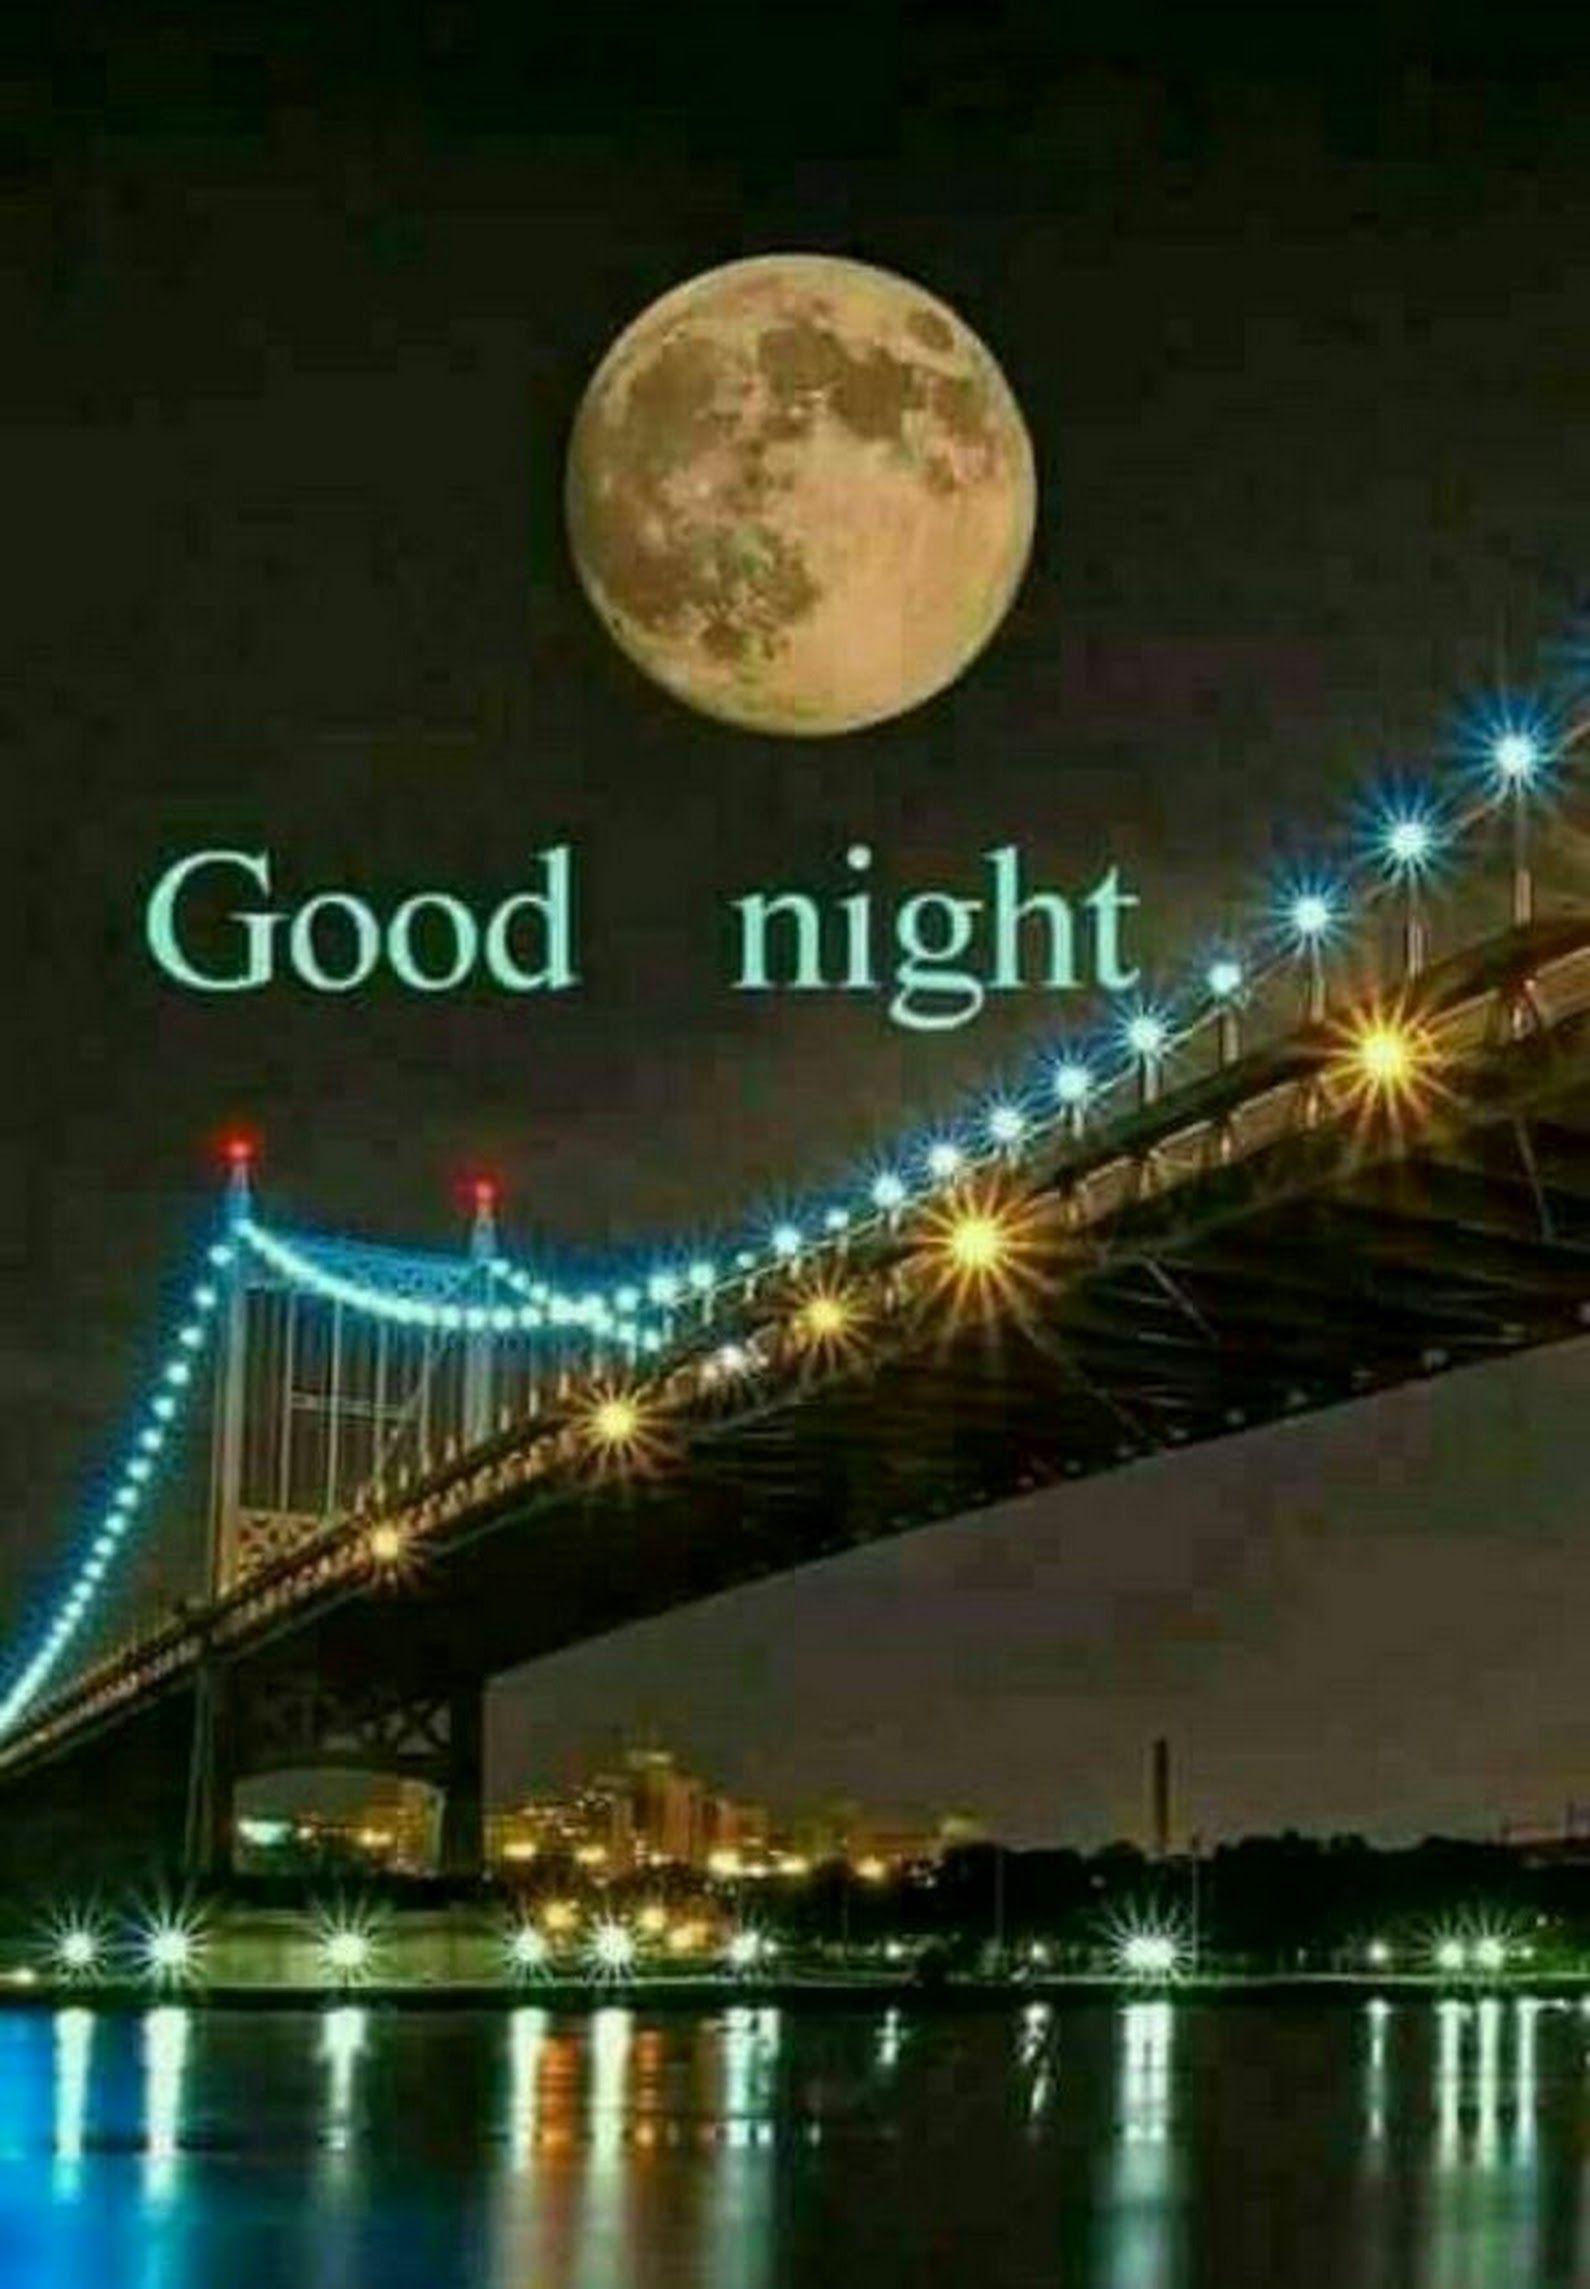 Gute nacht märchen kurz - Gute nacht märchen kurz